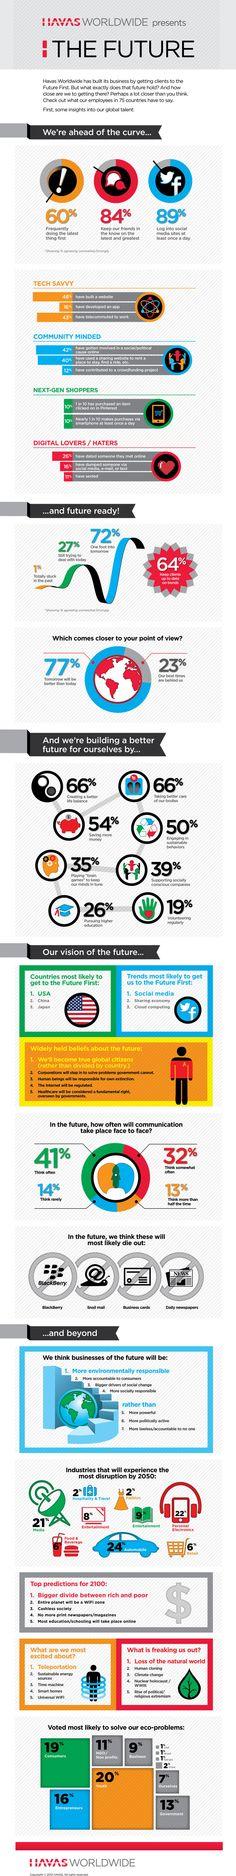 Havas Worldwide presents The Future #Havasww